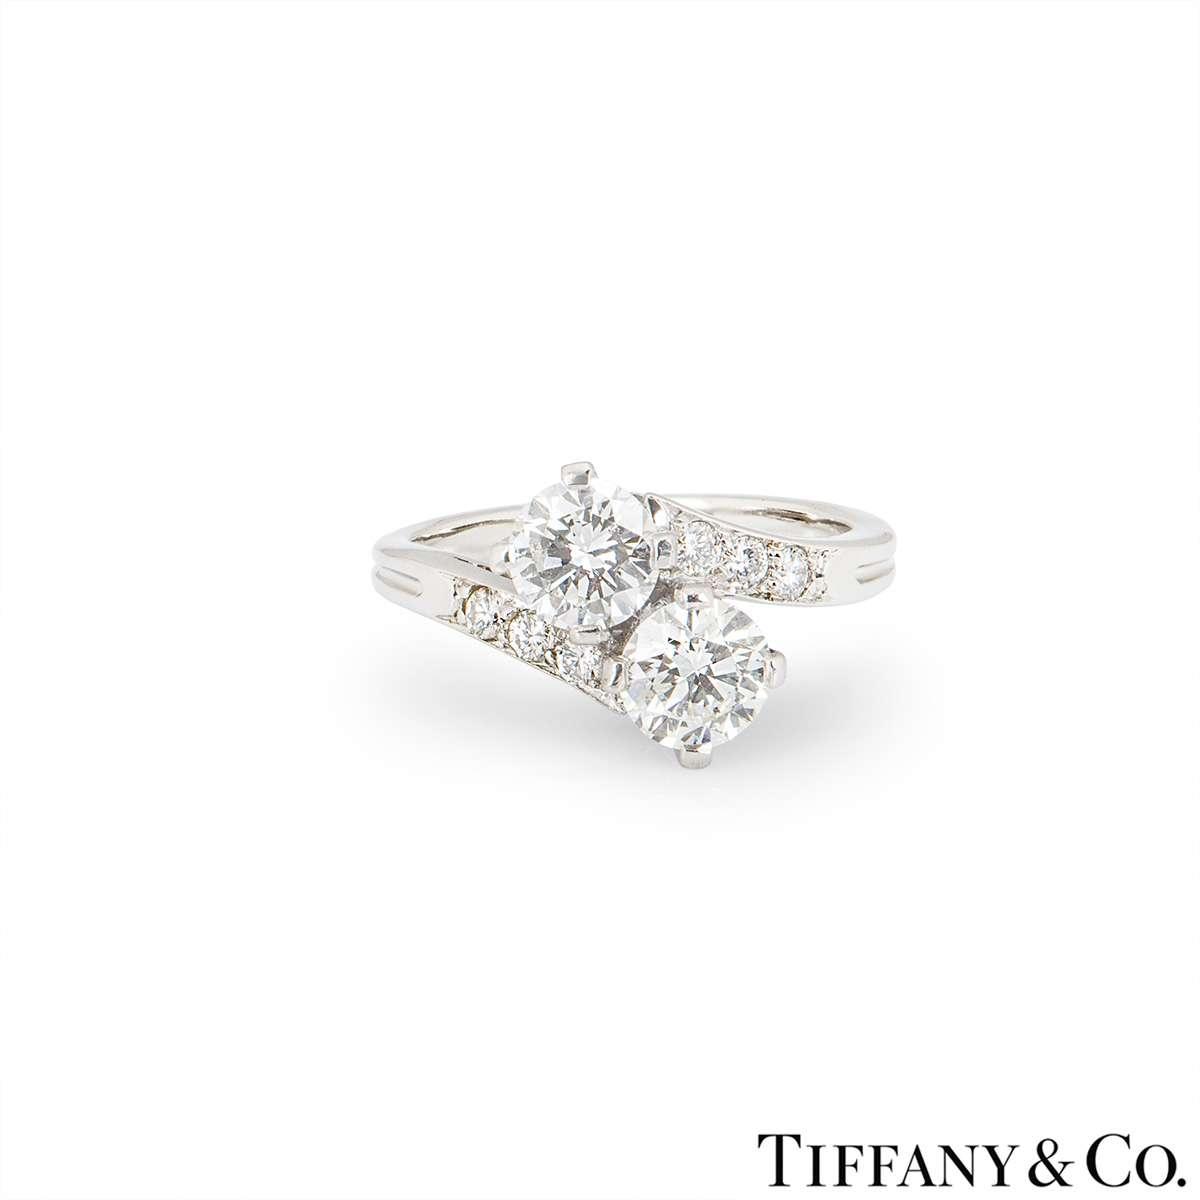 Tiffany & Co. Diamond Set Ring in Platinum C.1960s